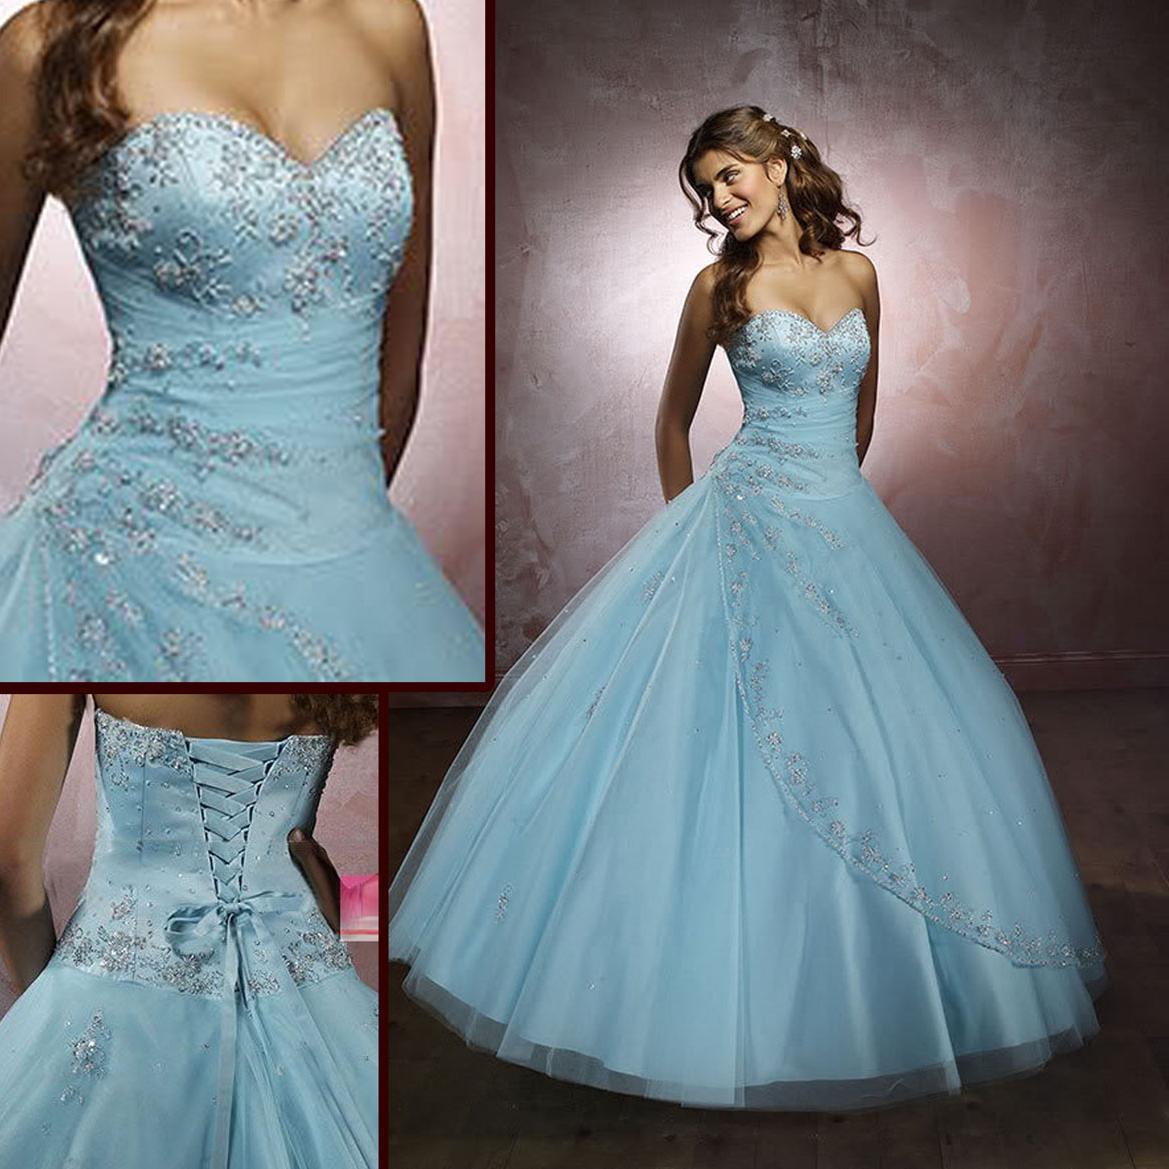 Wedding Dress White And Blue: Waffa's Blog: Three 3 Stargazer Lily Bulbs